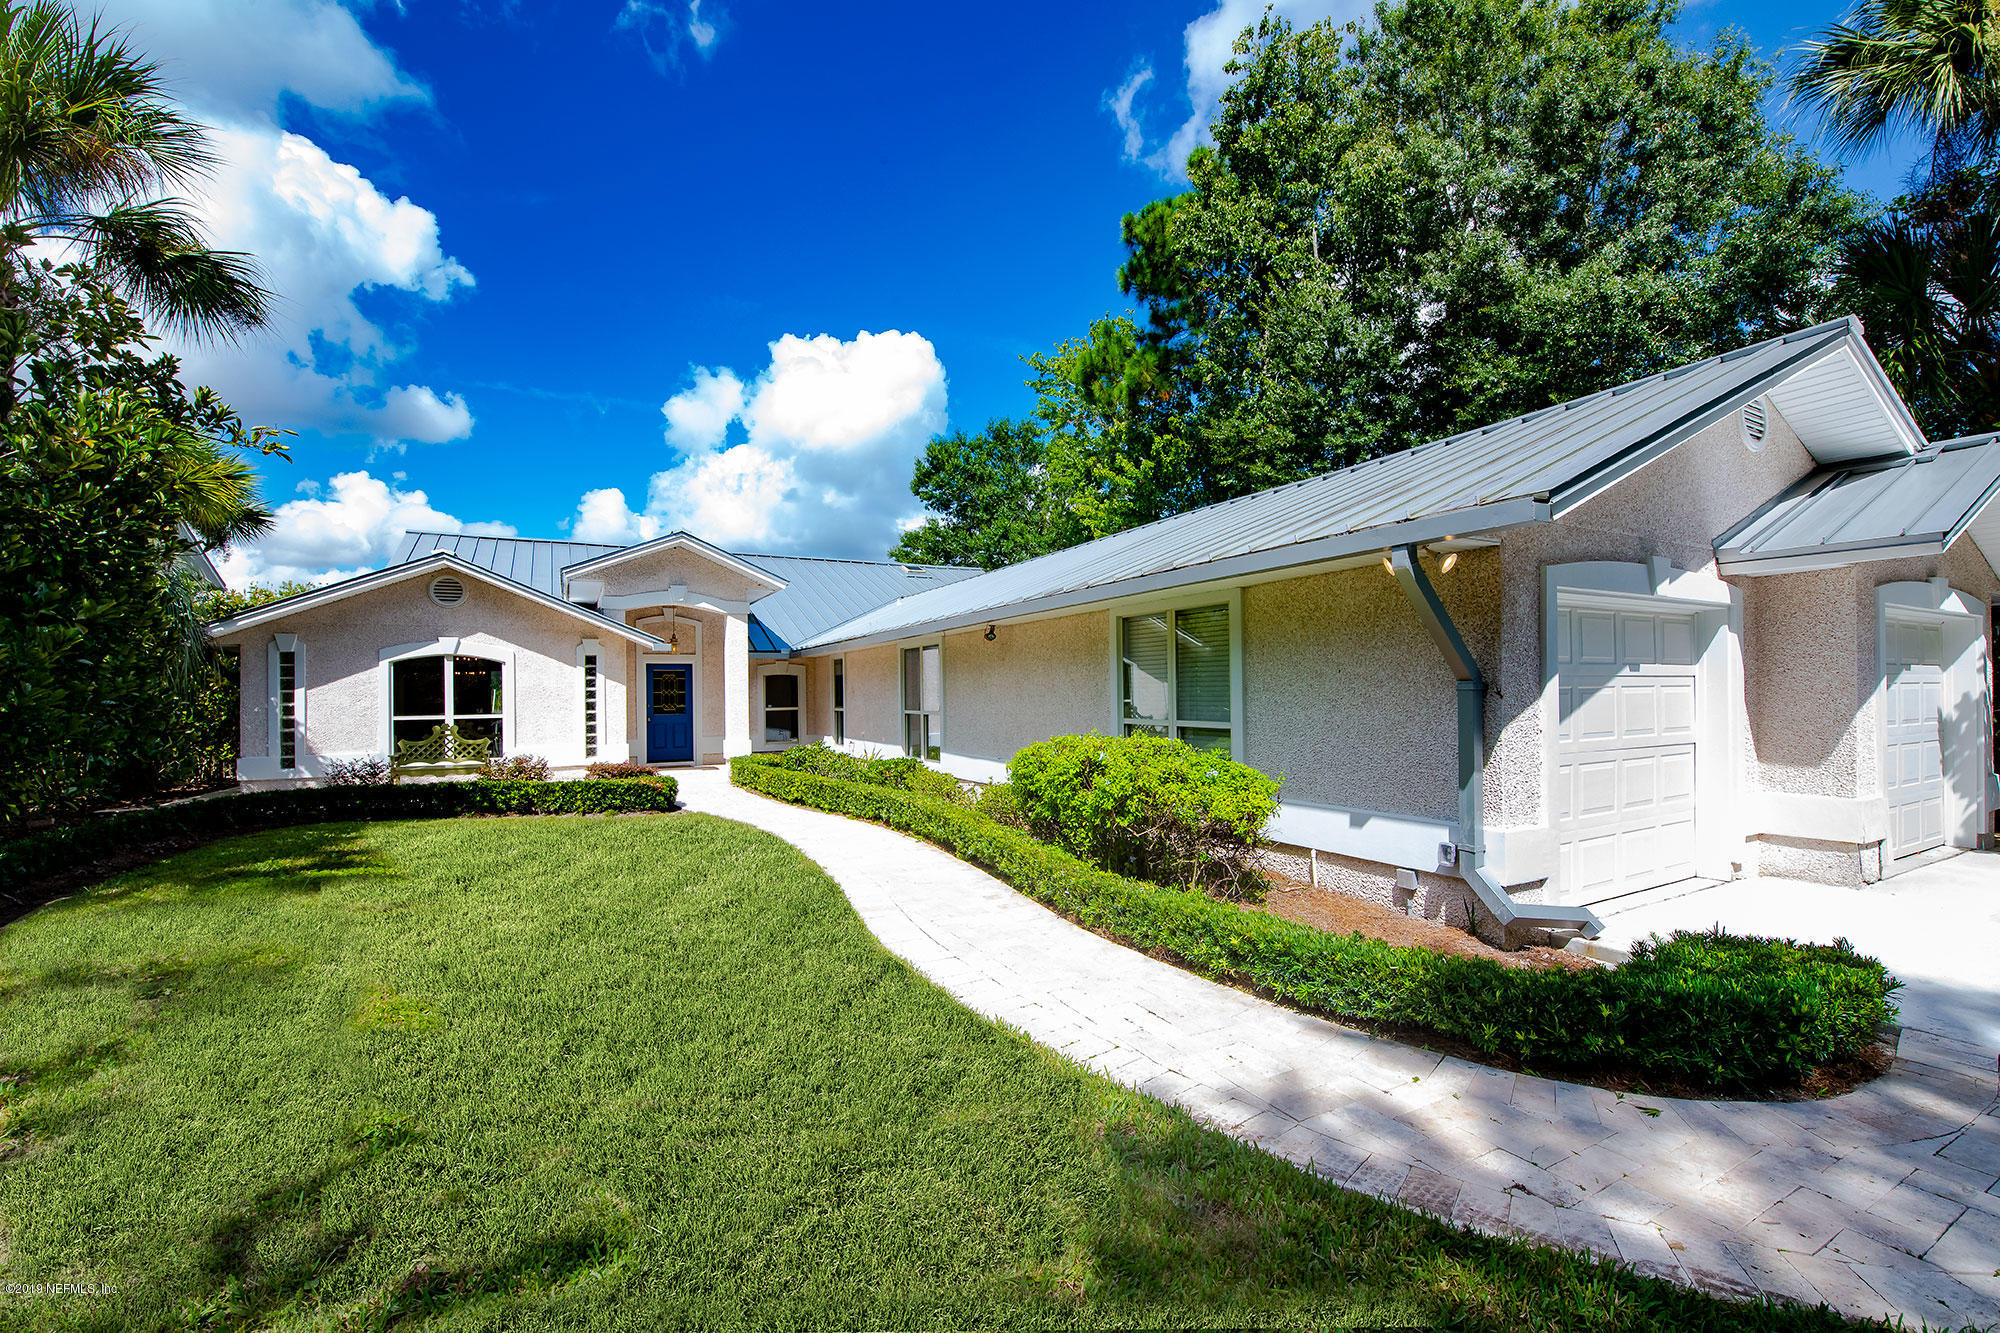 319 ROSCOE, PONTE VEDRA BEACH, FLORIDA 32082, 5 Bedrooms Bedrooms, ,3 BathroomsBathrooms,Residential - single family,For sale,ROSCOE,1012782